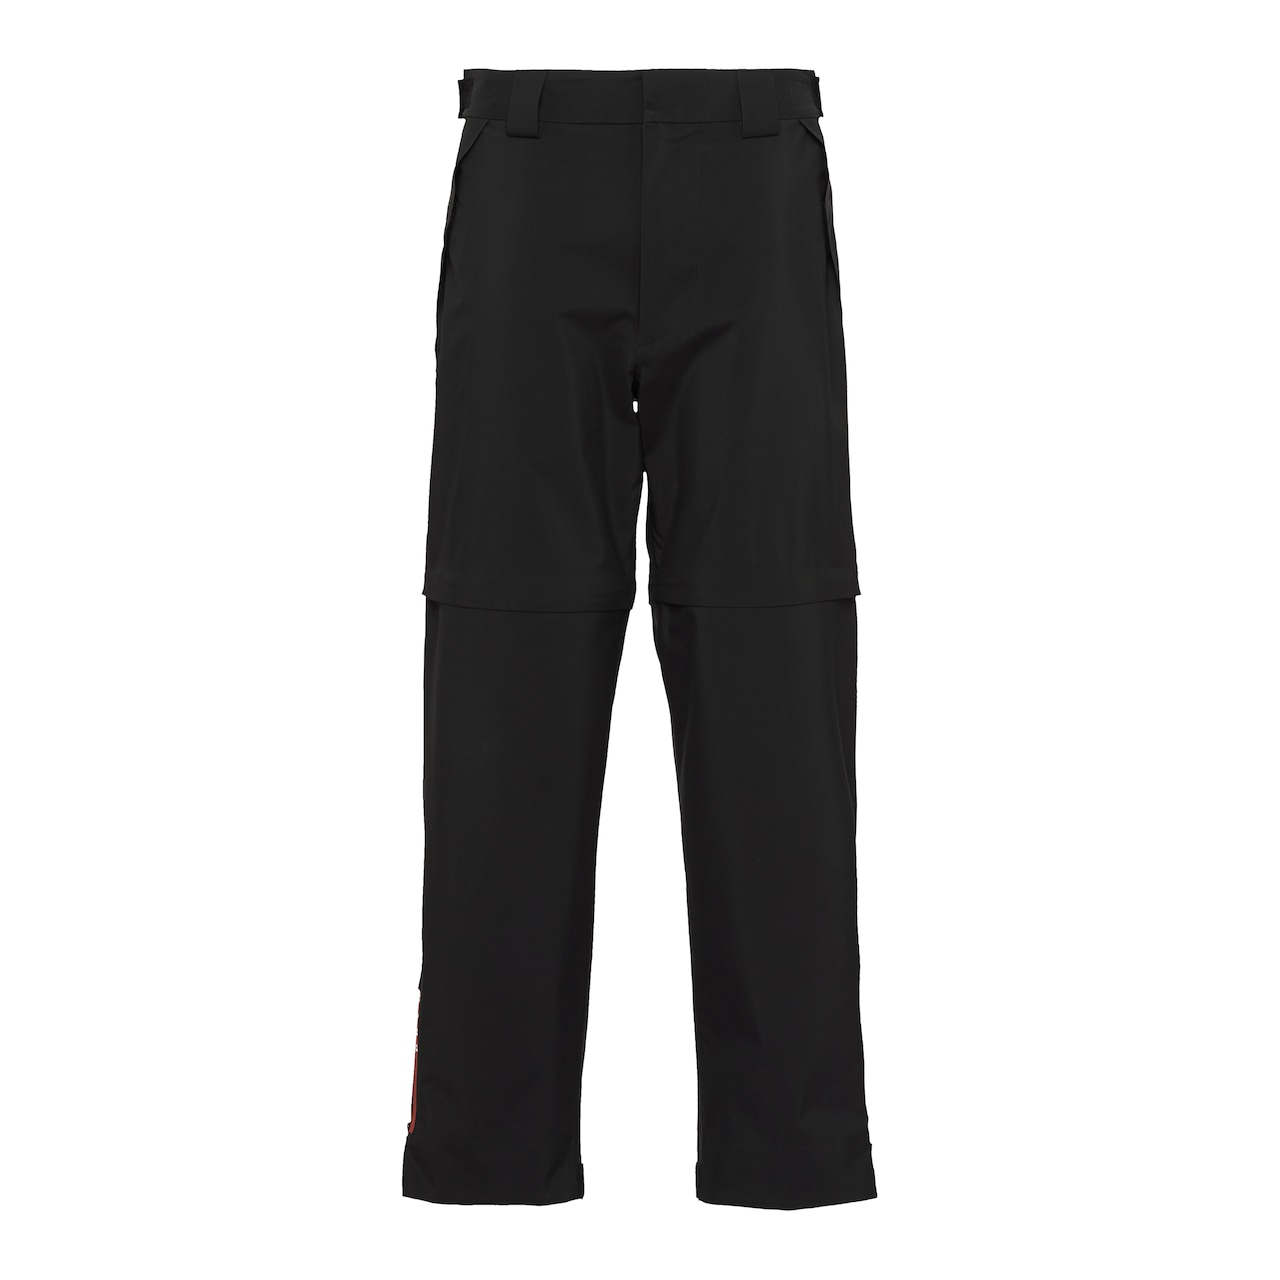 Prada LR-MX023 织物长裤 1